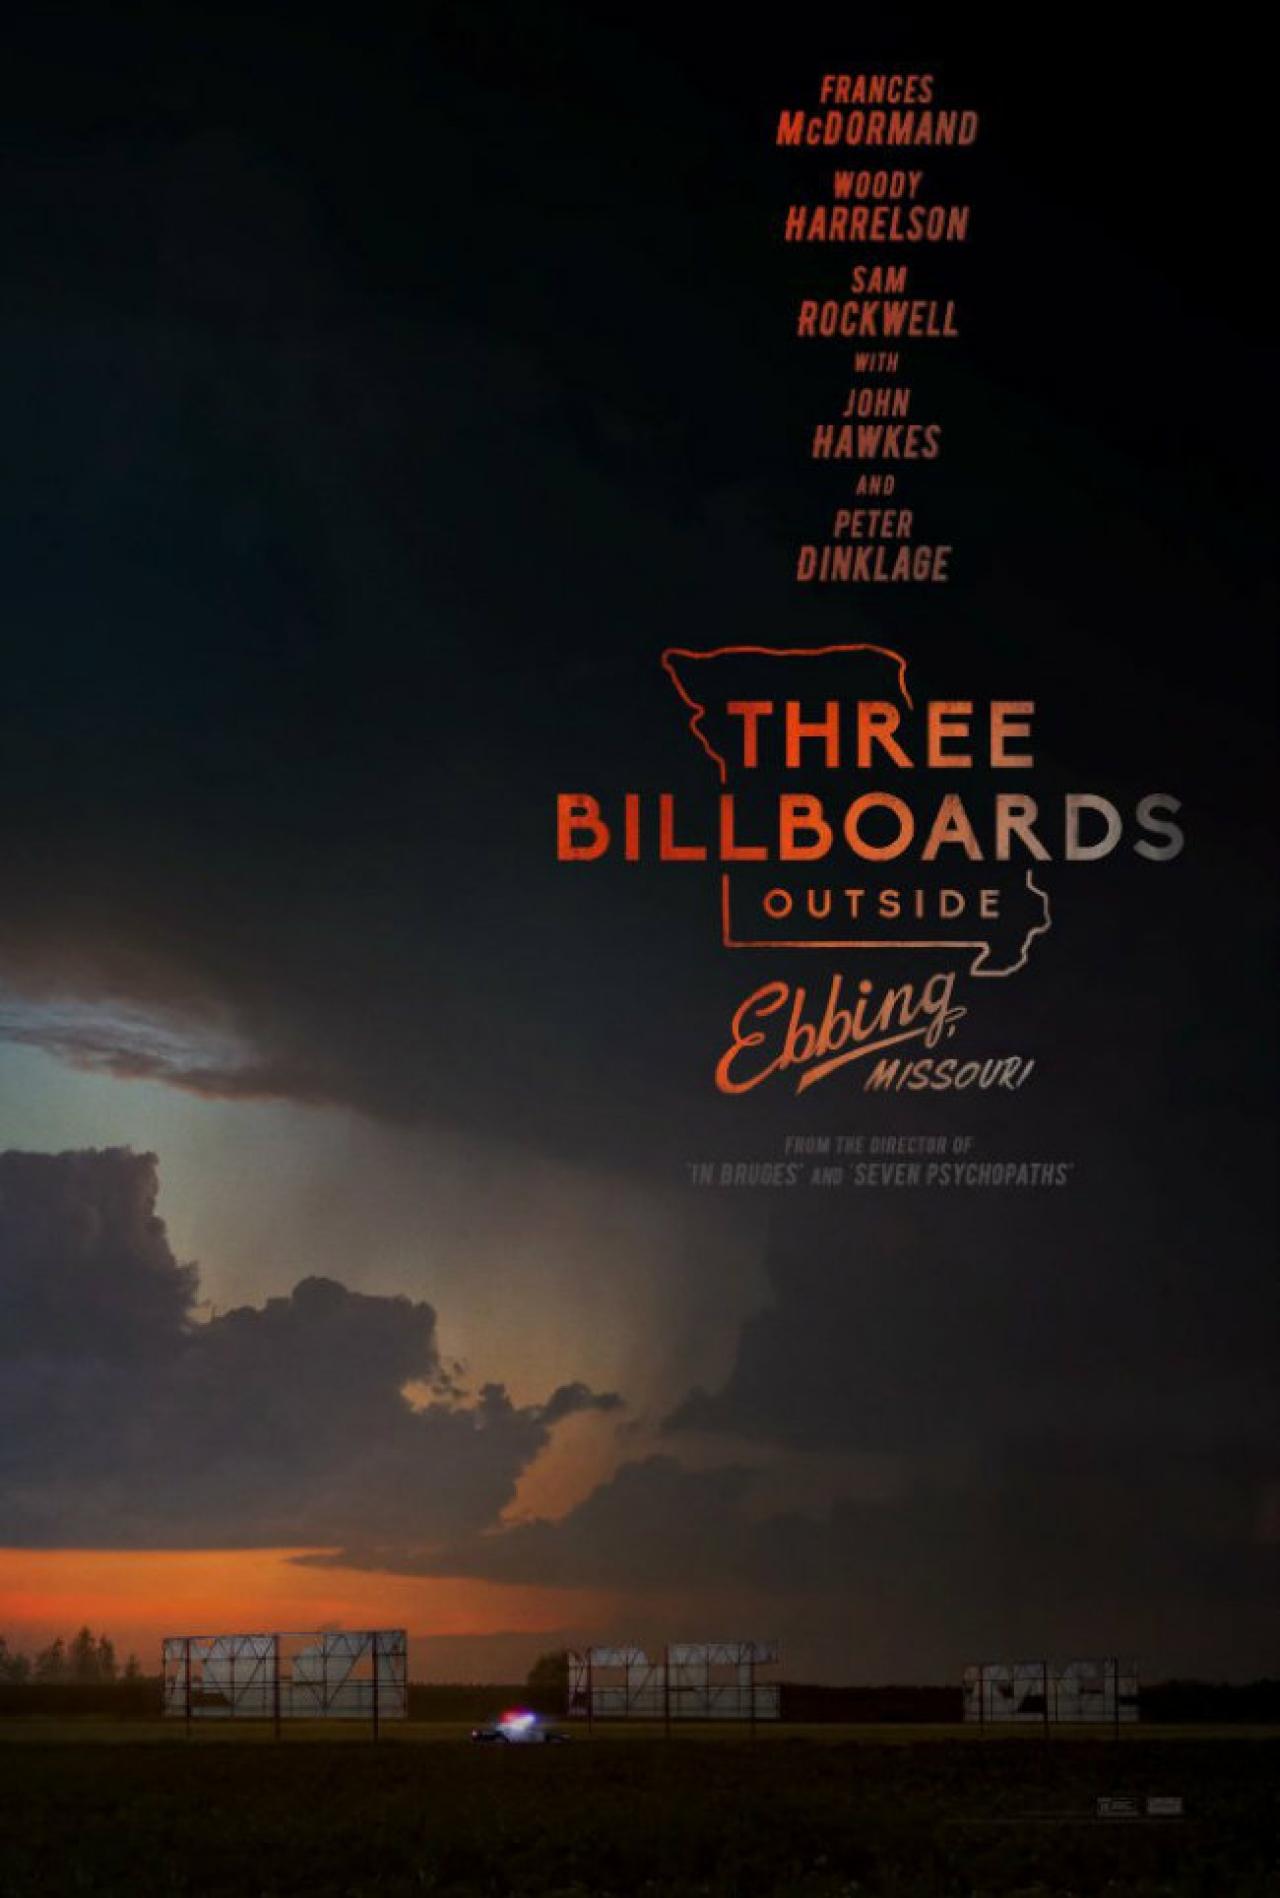 HAFTANIN FİLMİ : THREE BILLBOARDS OUTSIDE EBBING,MISSOURI